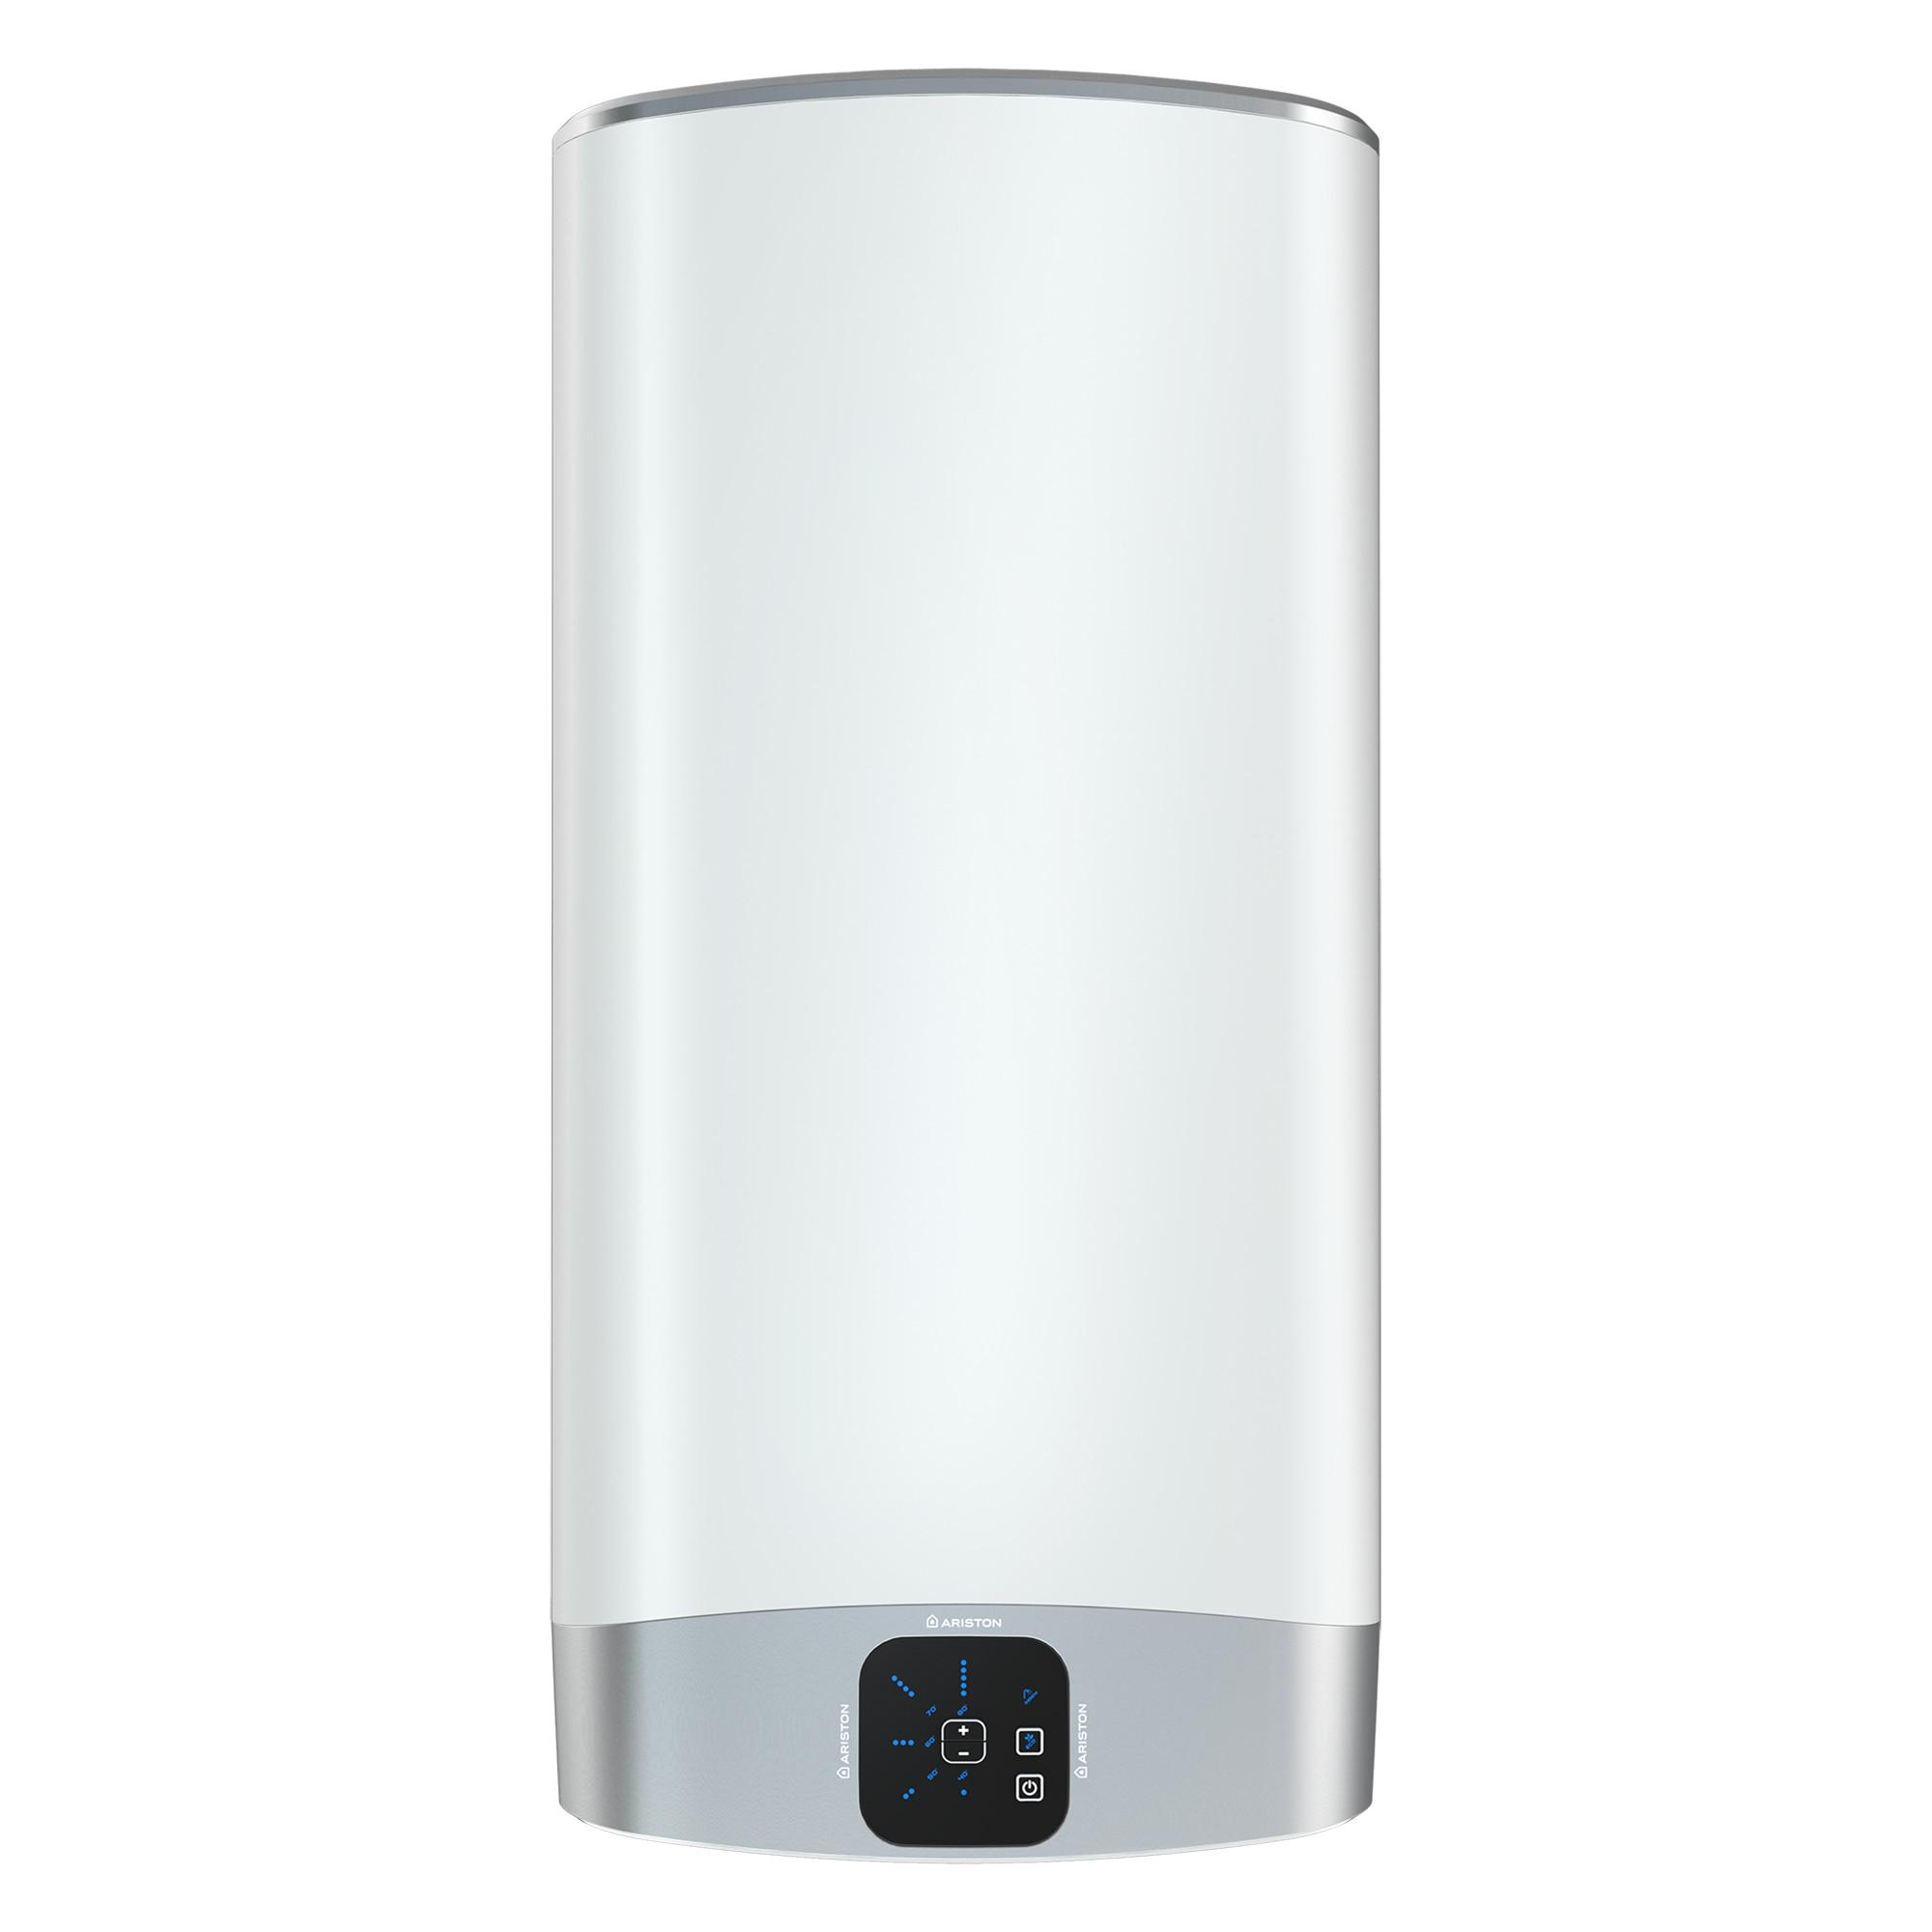 Fotografie Boiler electric Ariston Velis Evo 100 EU, 2 x 1500 W, 100 l, 0.8 Mpa, Functie ECO EVO, Izolatie termica, Doua rezervoare, Protectie electrica IPX4, Instalare V/O